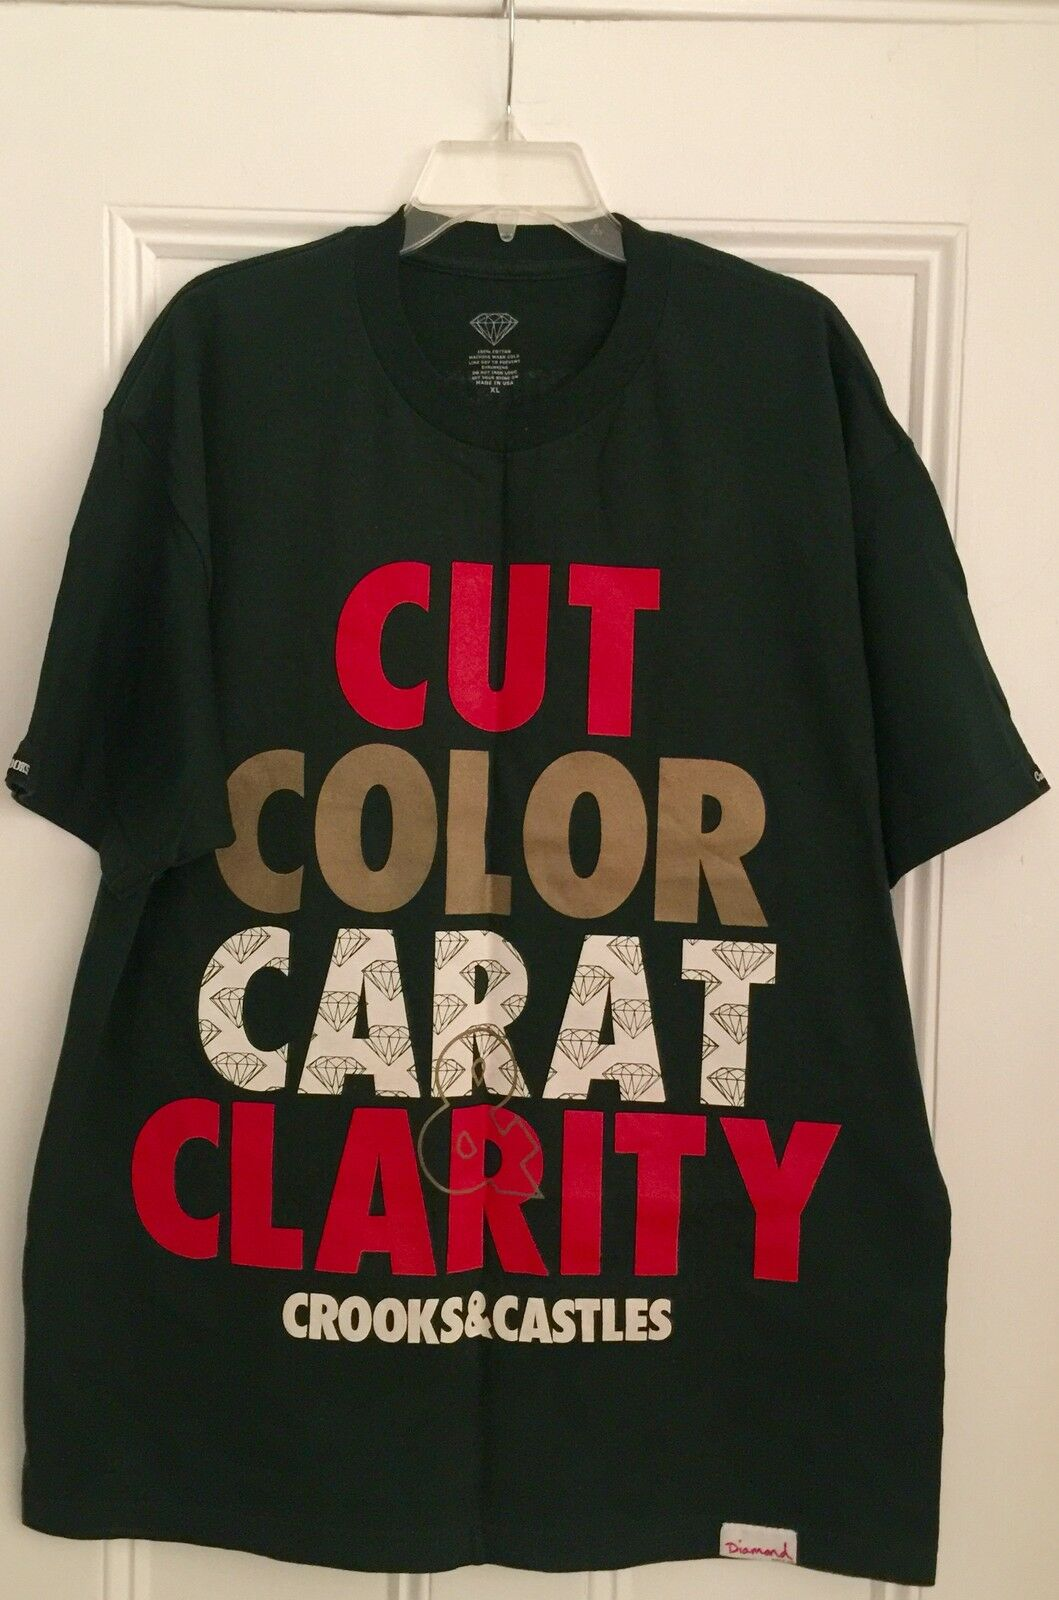 Authentic Crooks & Castles Diamond Supply Cut color Carat Clarity Supreme rare